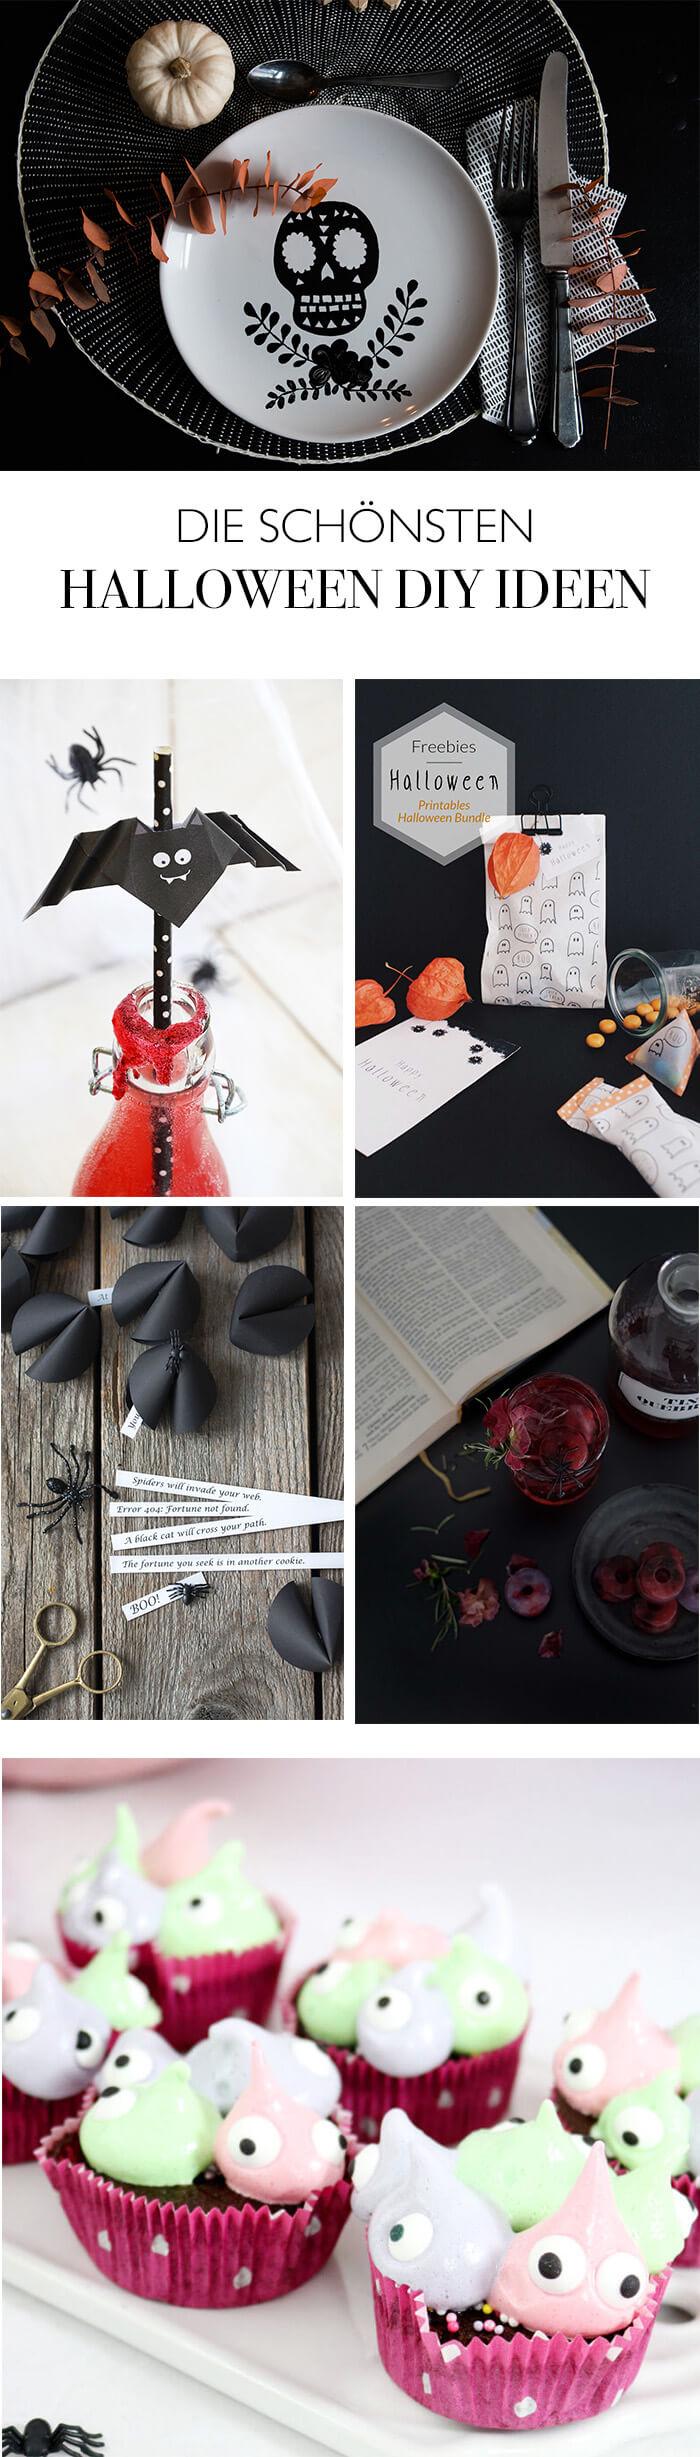 Halloween DIY Ideen von meinen liebsten DIY Blogs - Halloween Deko basteln - Halloween Cocktails mixen - Monster cupcakes backen